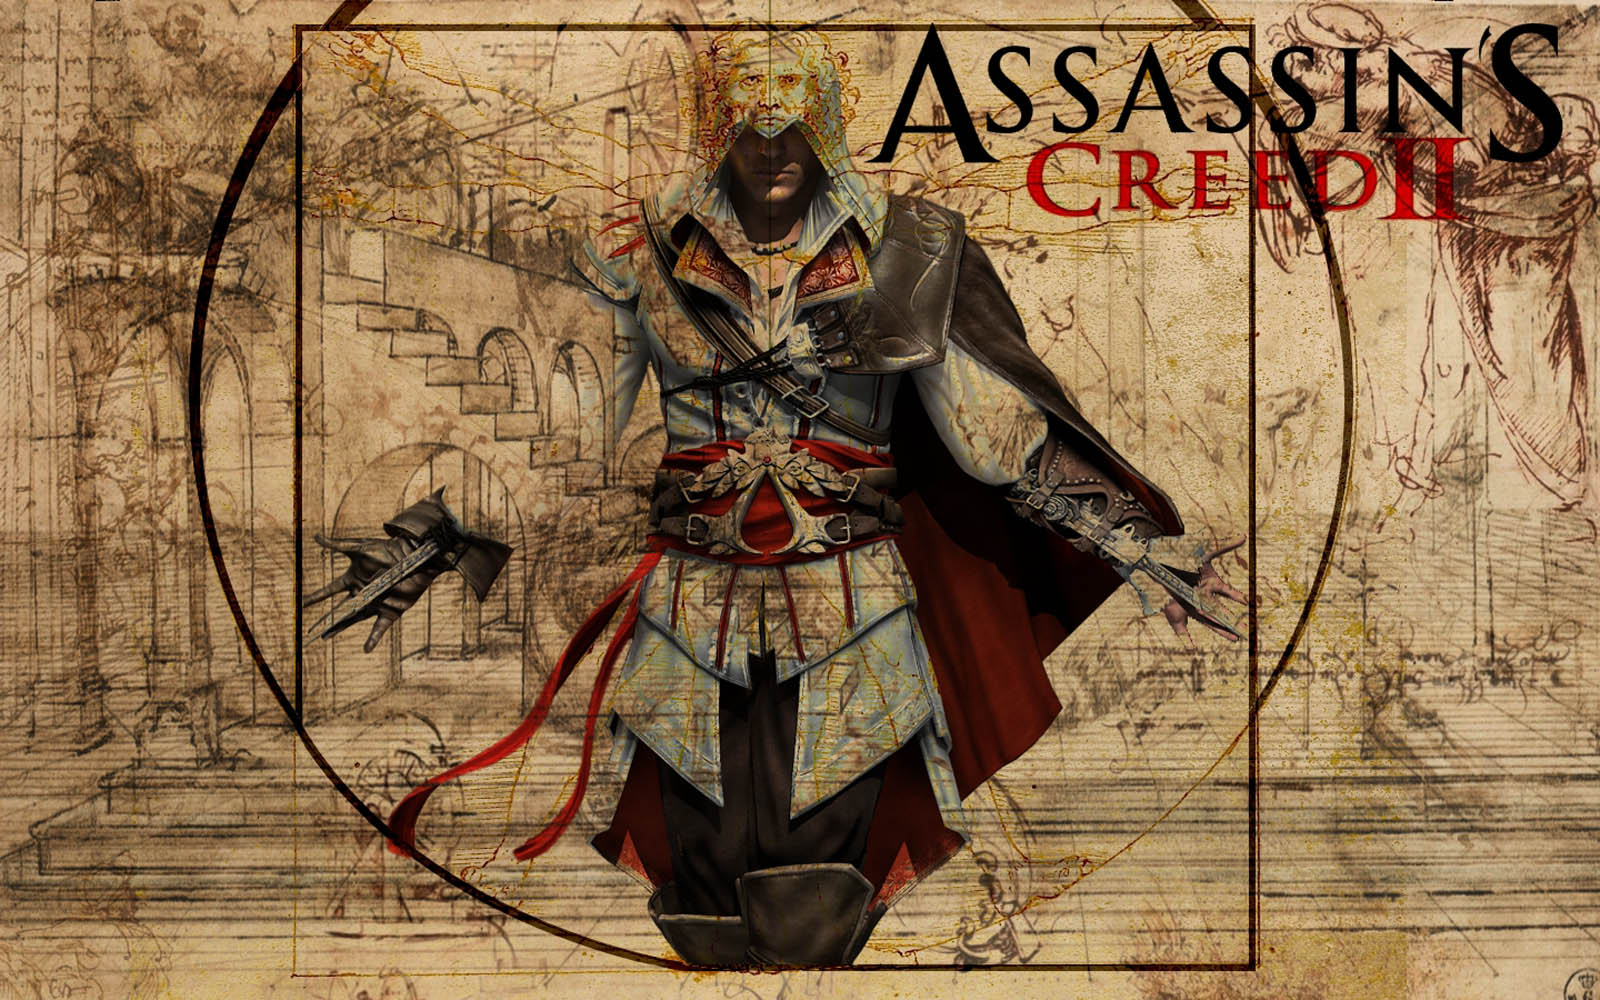 Xs wallpapers hd assassin 39 s creed 2 game wallpapers - Assasins wallpaper ...